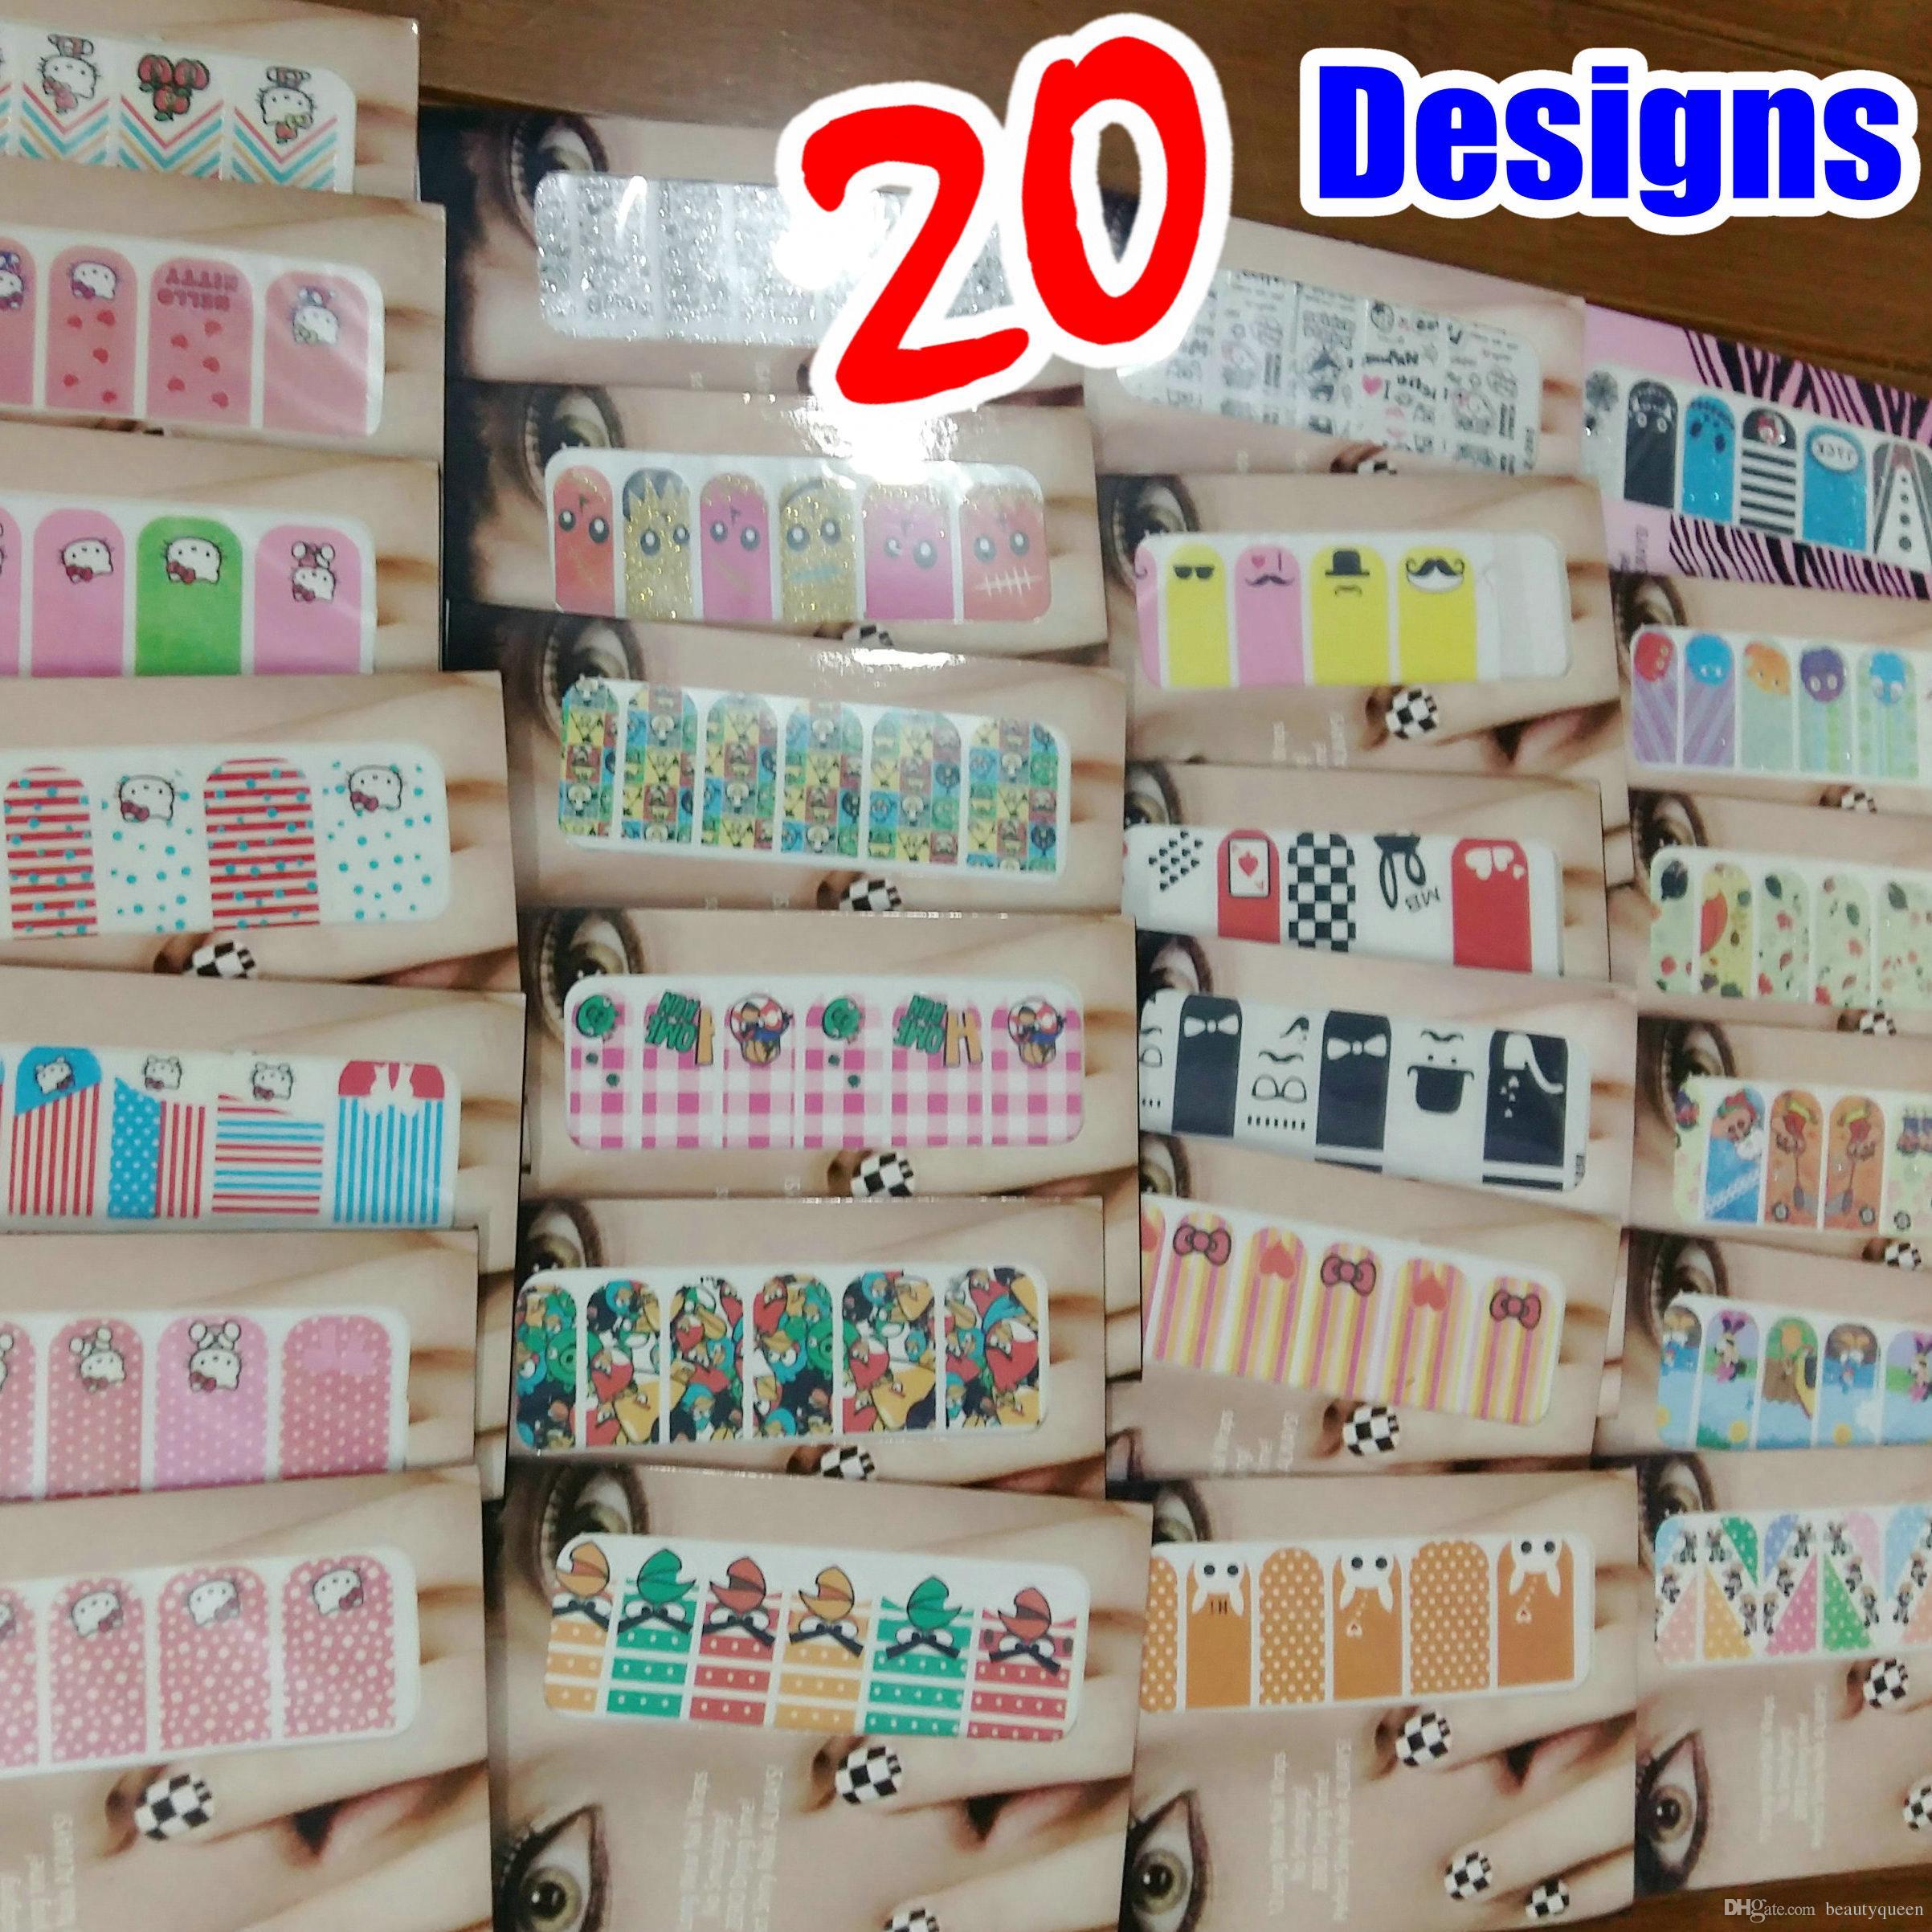 20 Entwürfe Cartoon Anime nette Katze Nail Wrap Wraps Aufkleber-Nagellack-Streifen-Streifen-Aufkleber-Flecken-Folien Tipps Abziehbilder DIY NEU * Hohe Qualität